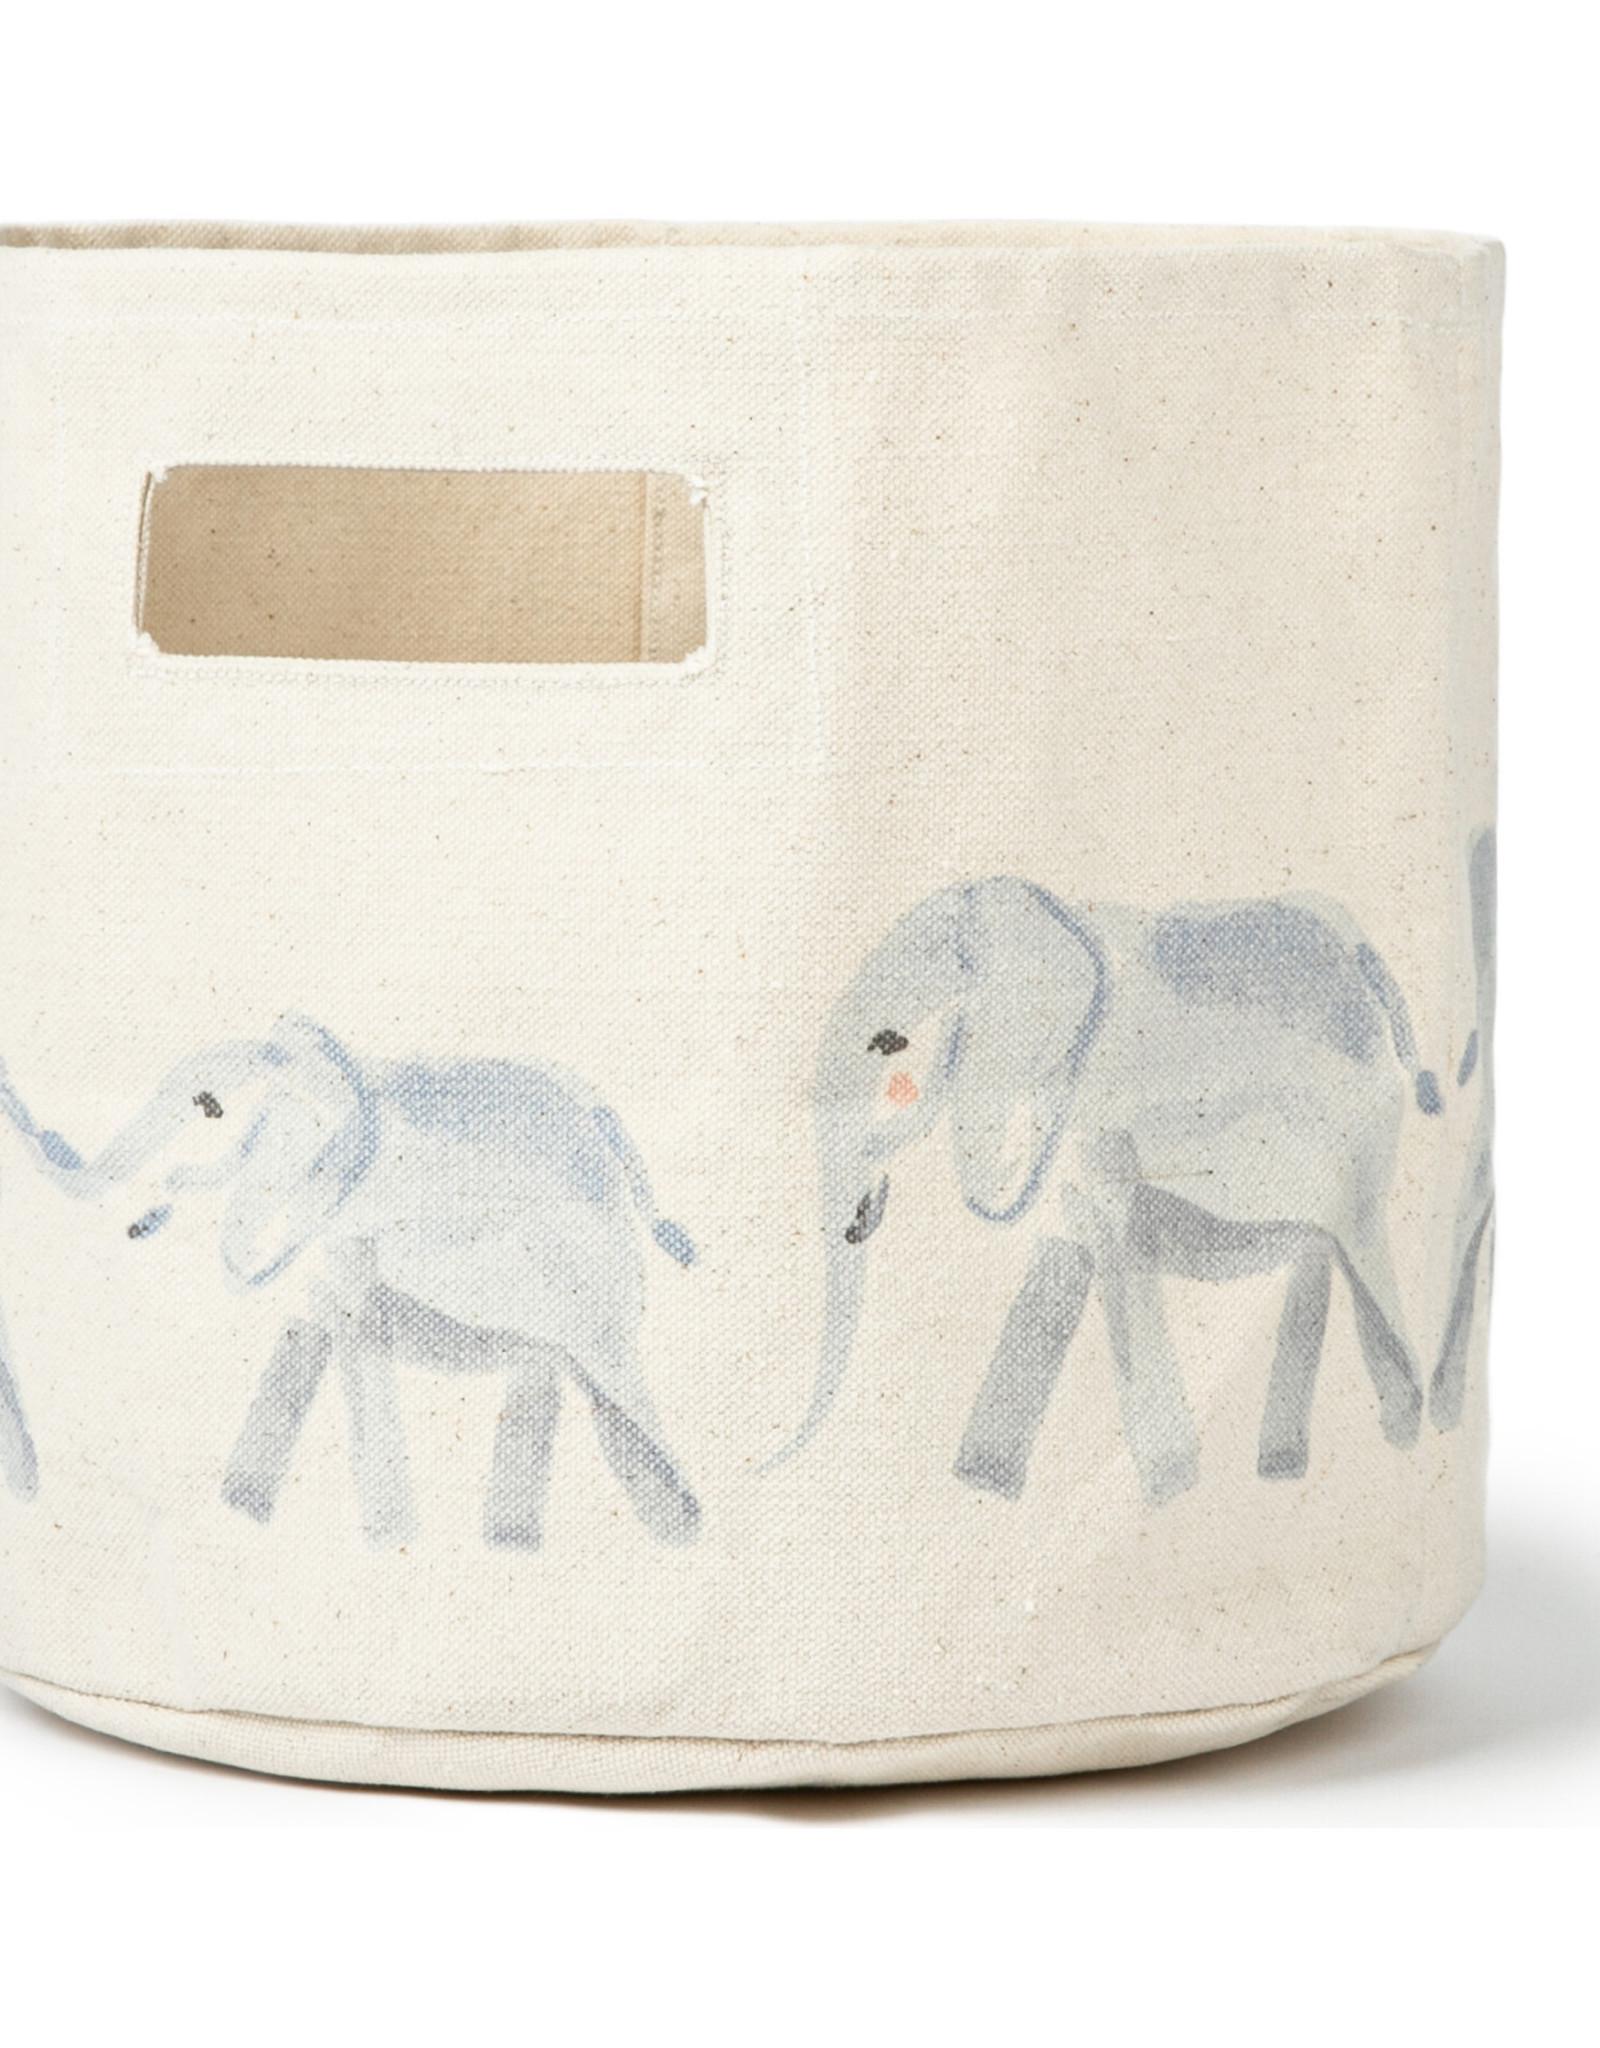 Pehr Printed Pint - Elephant